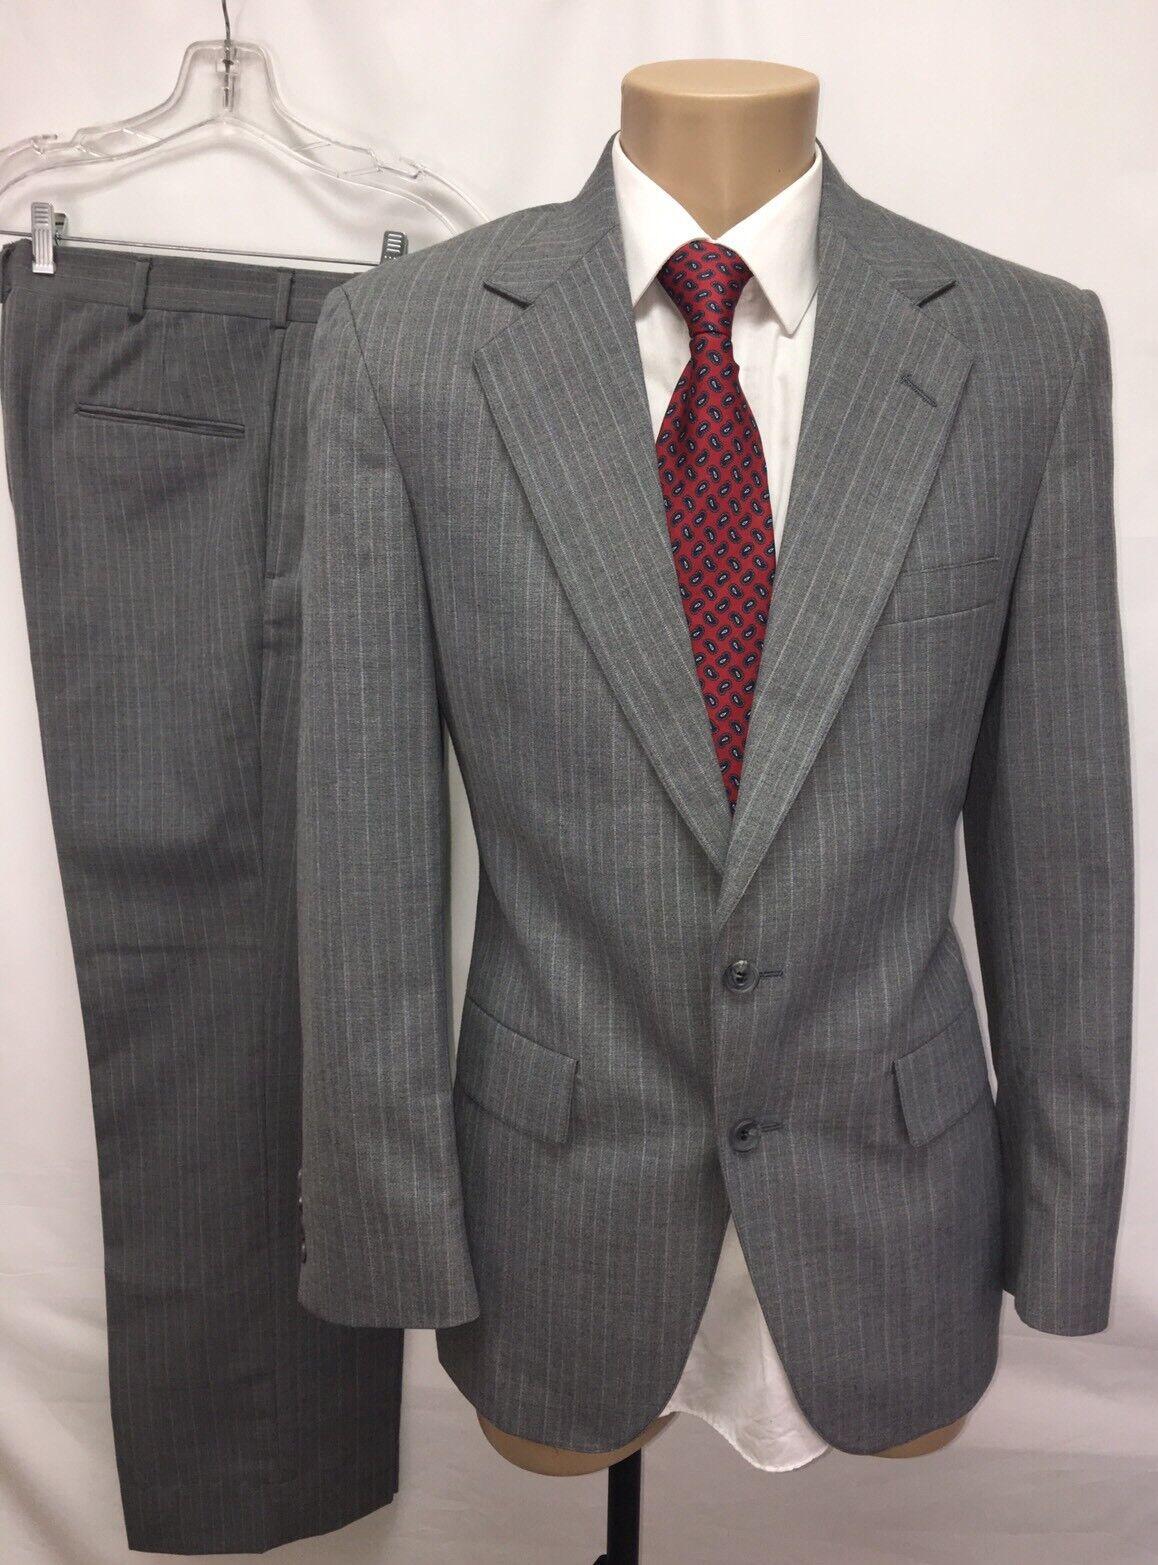 VTG RICHARD THOMAS FINE CLOTHING  Herren 2 PC grau PINSTRIPE SUIT SZ 38R 2 BTN MINT